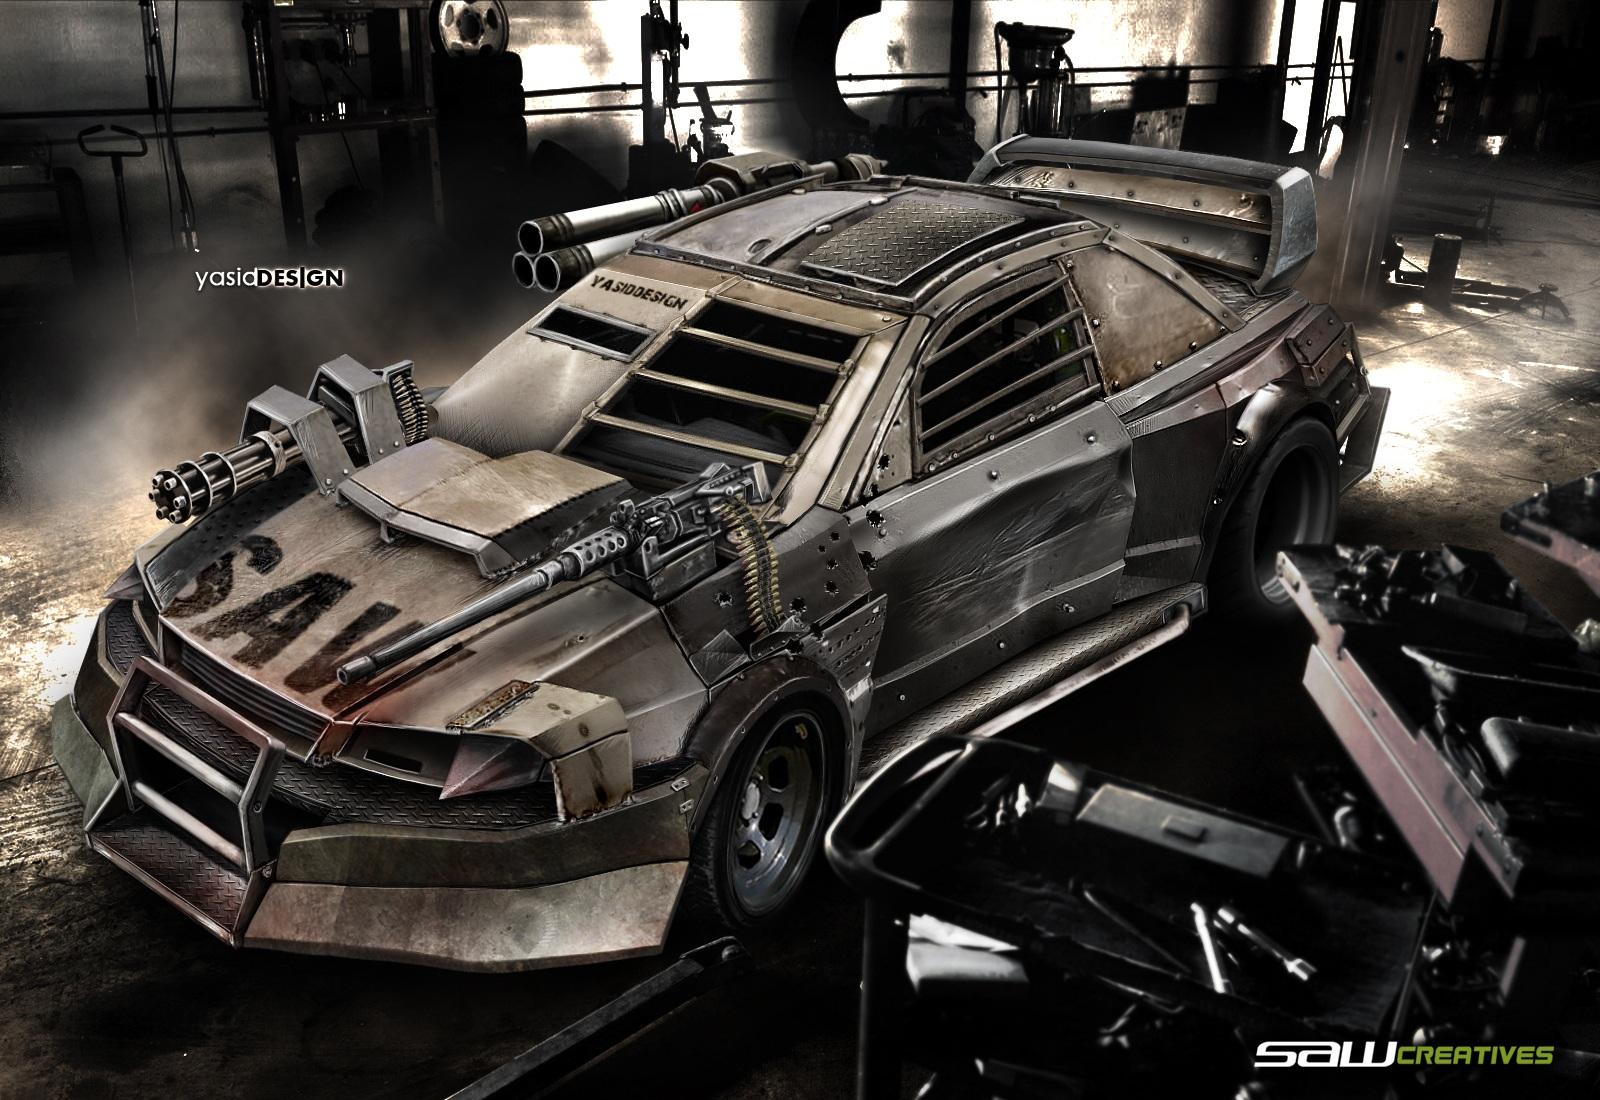 DEATHRACE Subaru Impreza 22B by yasiddesign